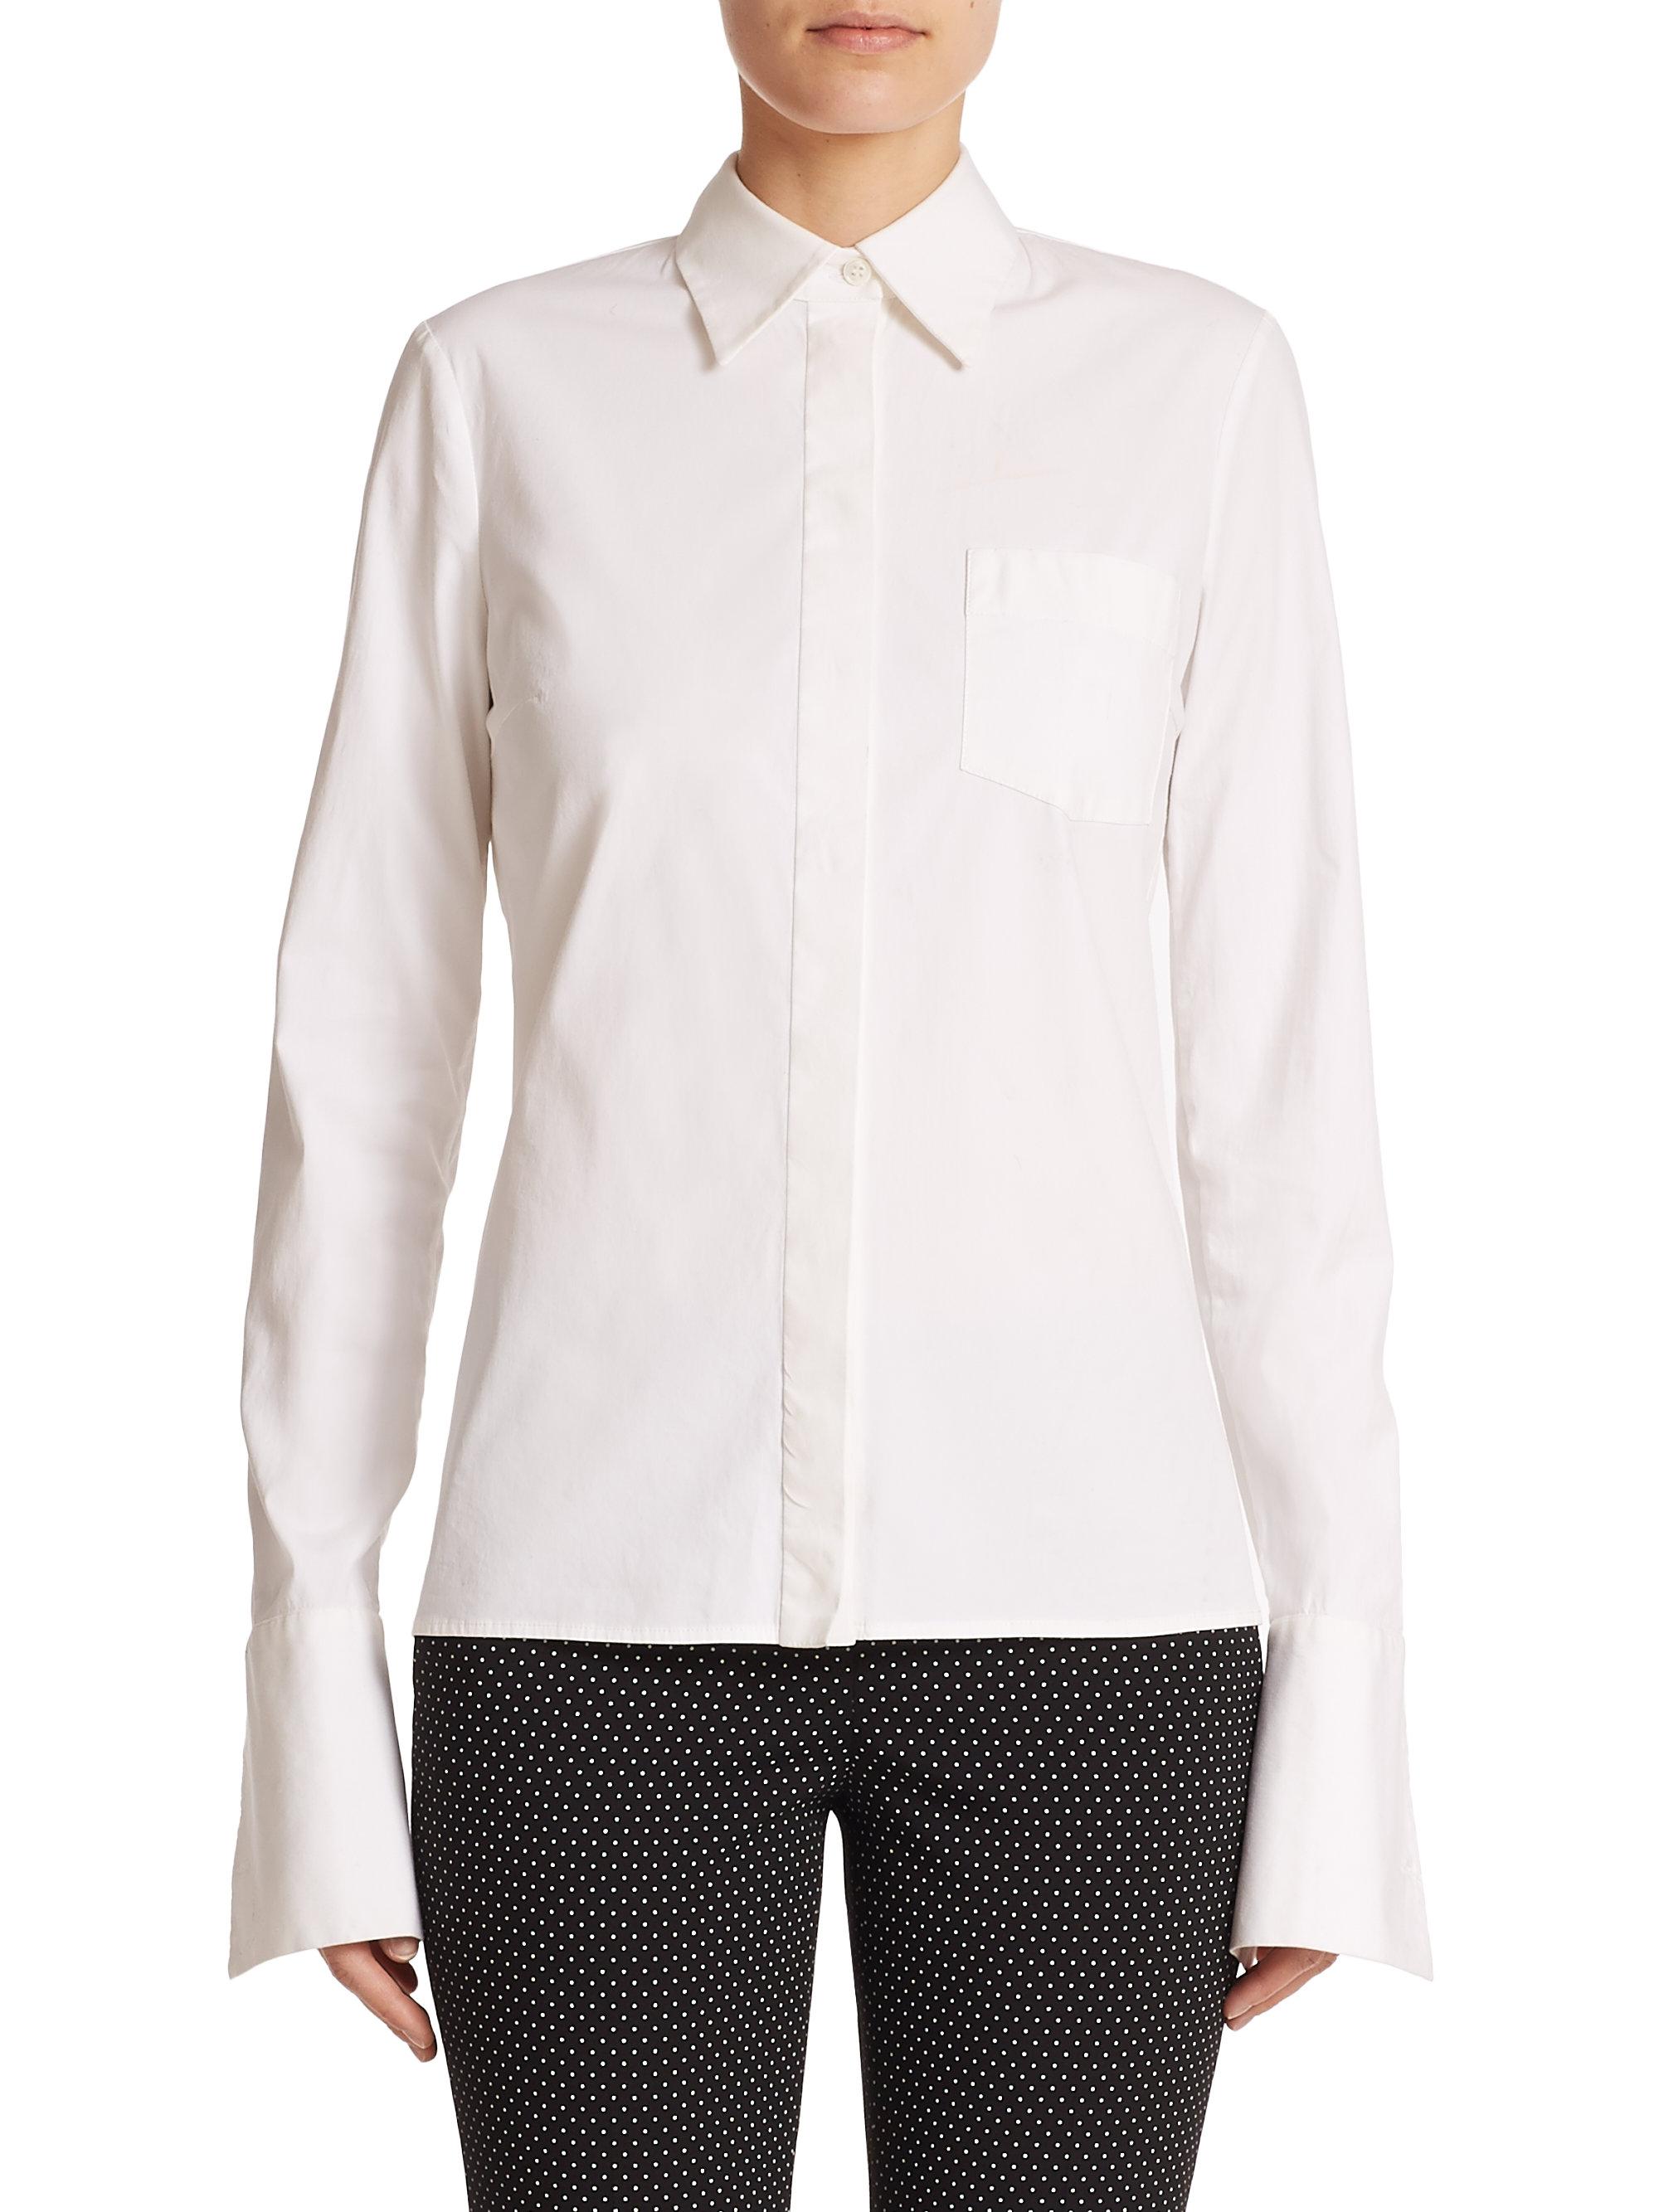 Michael kors button down dress shirt in white lyst for White button down dress shirt